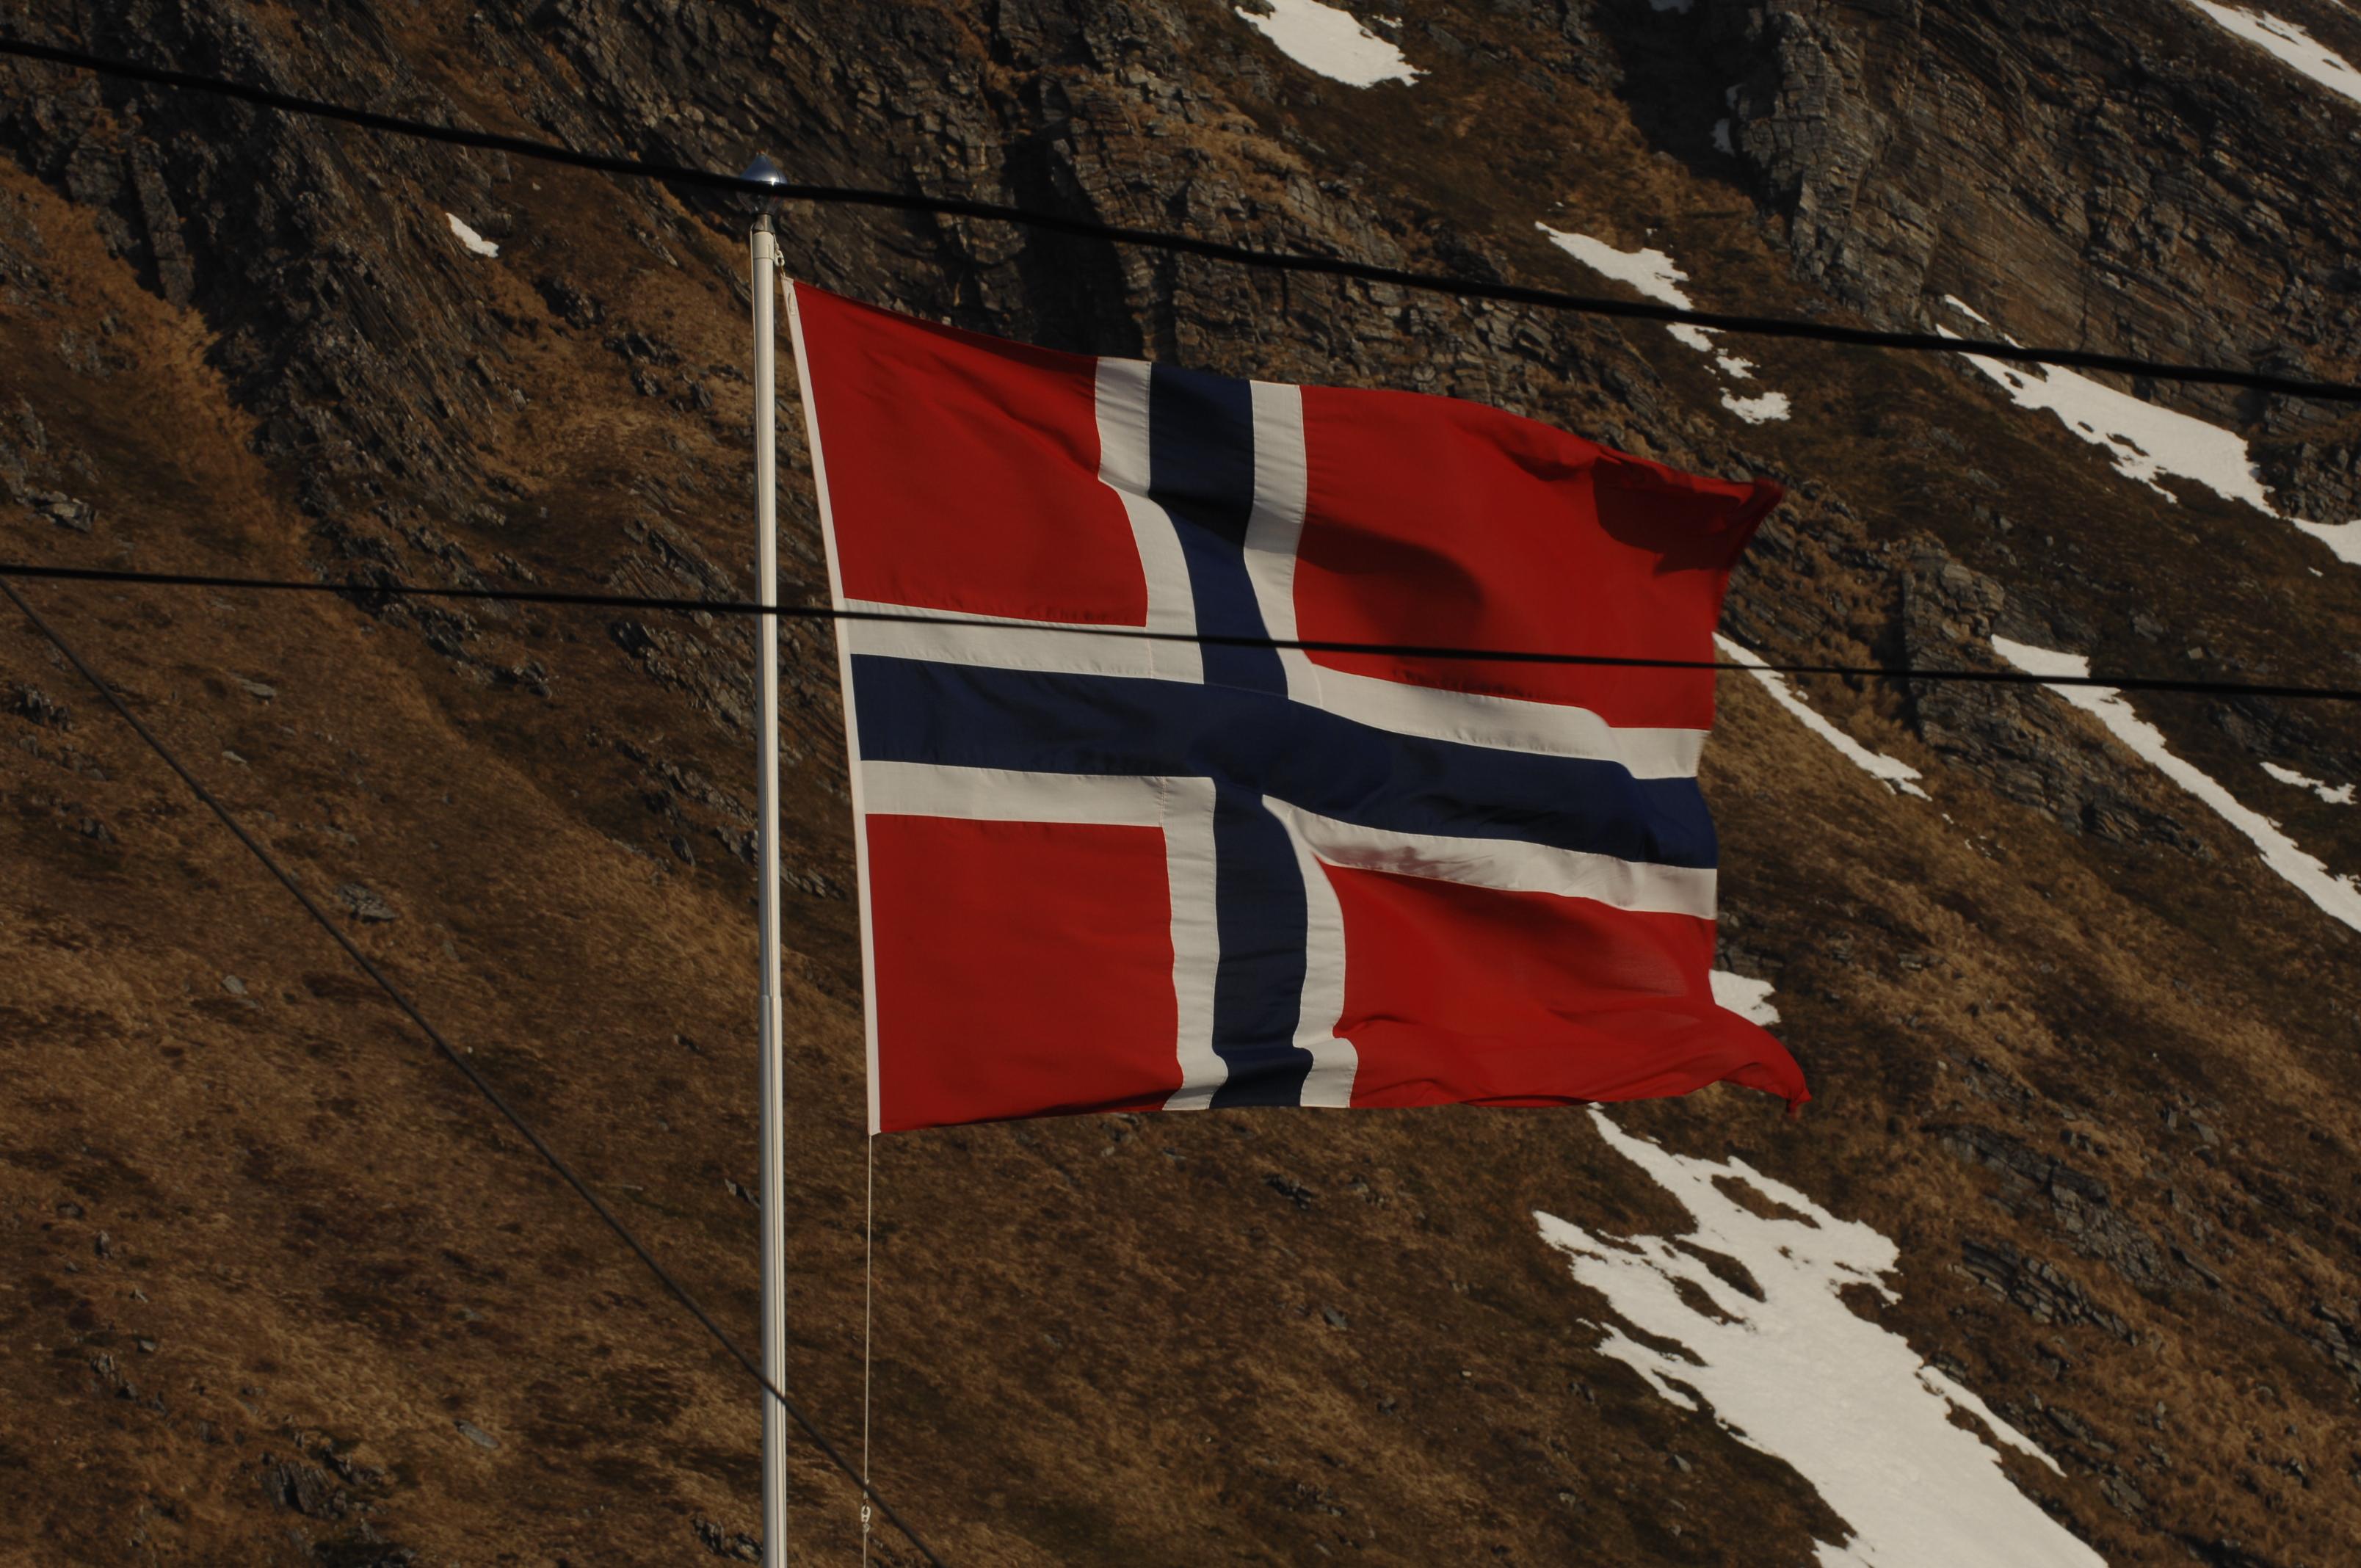 norwegian-flag-snow-norway